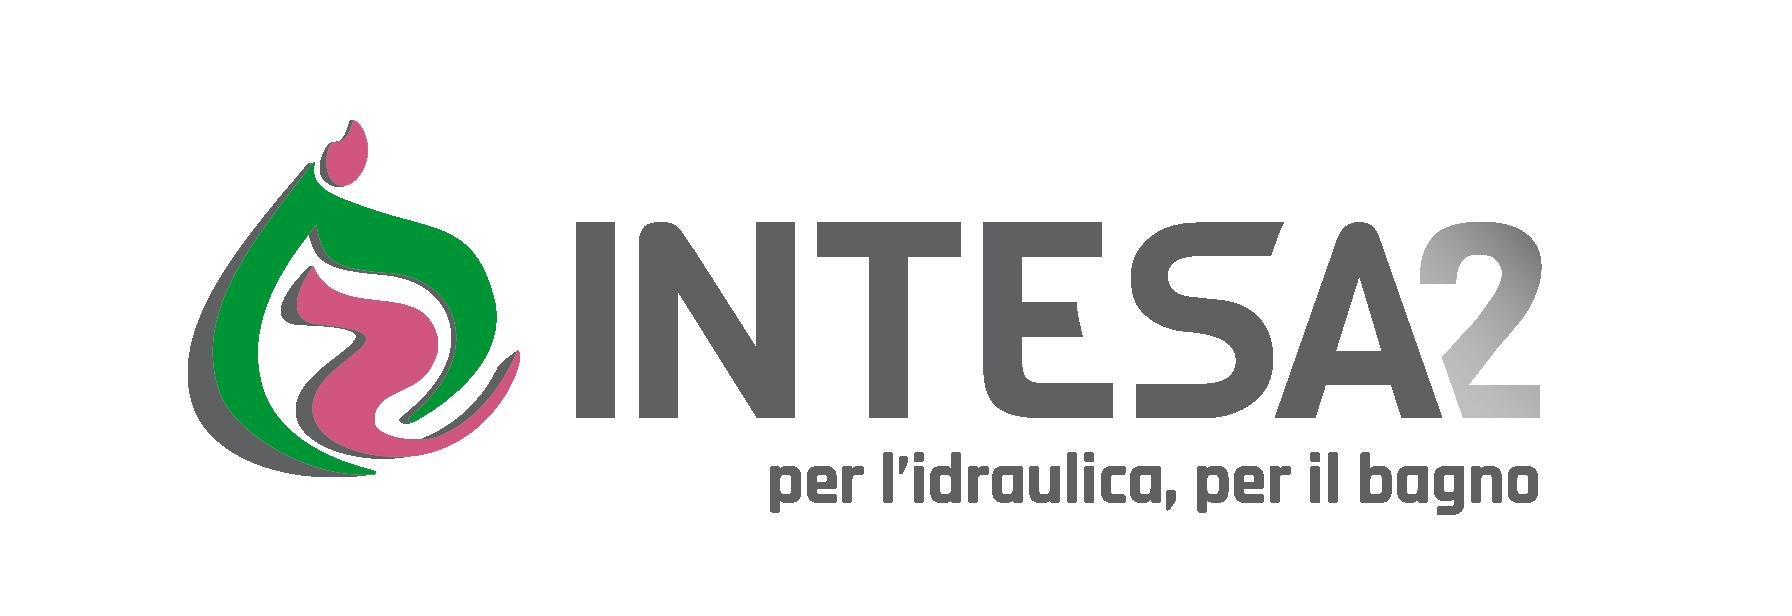 Intesa2